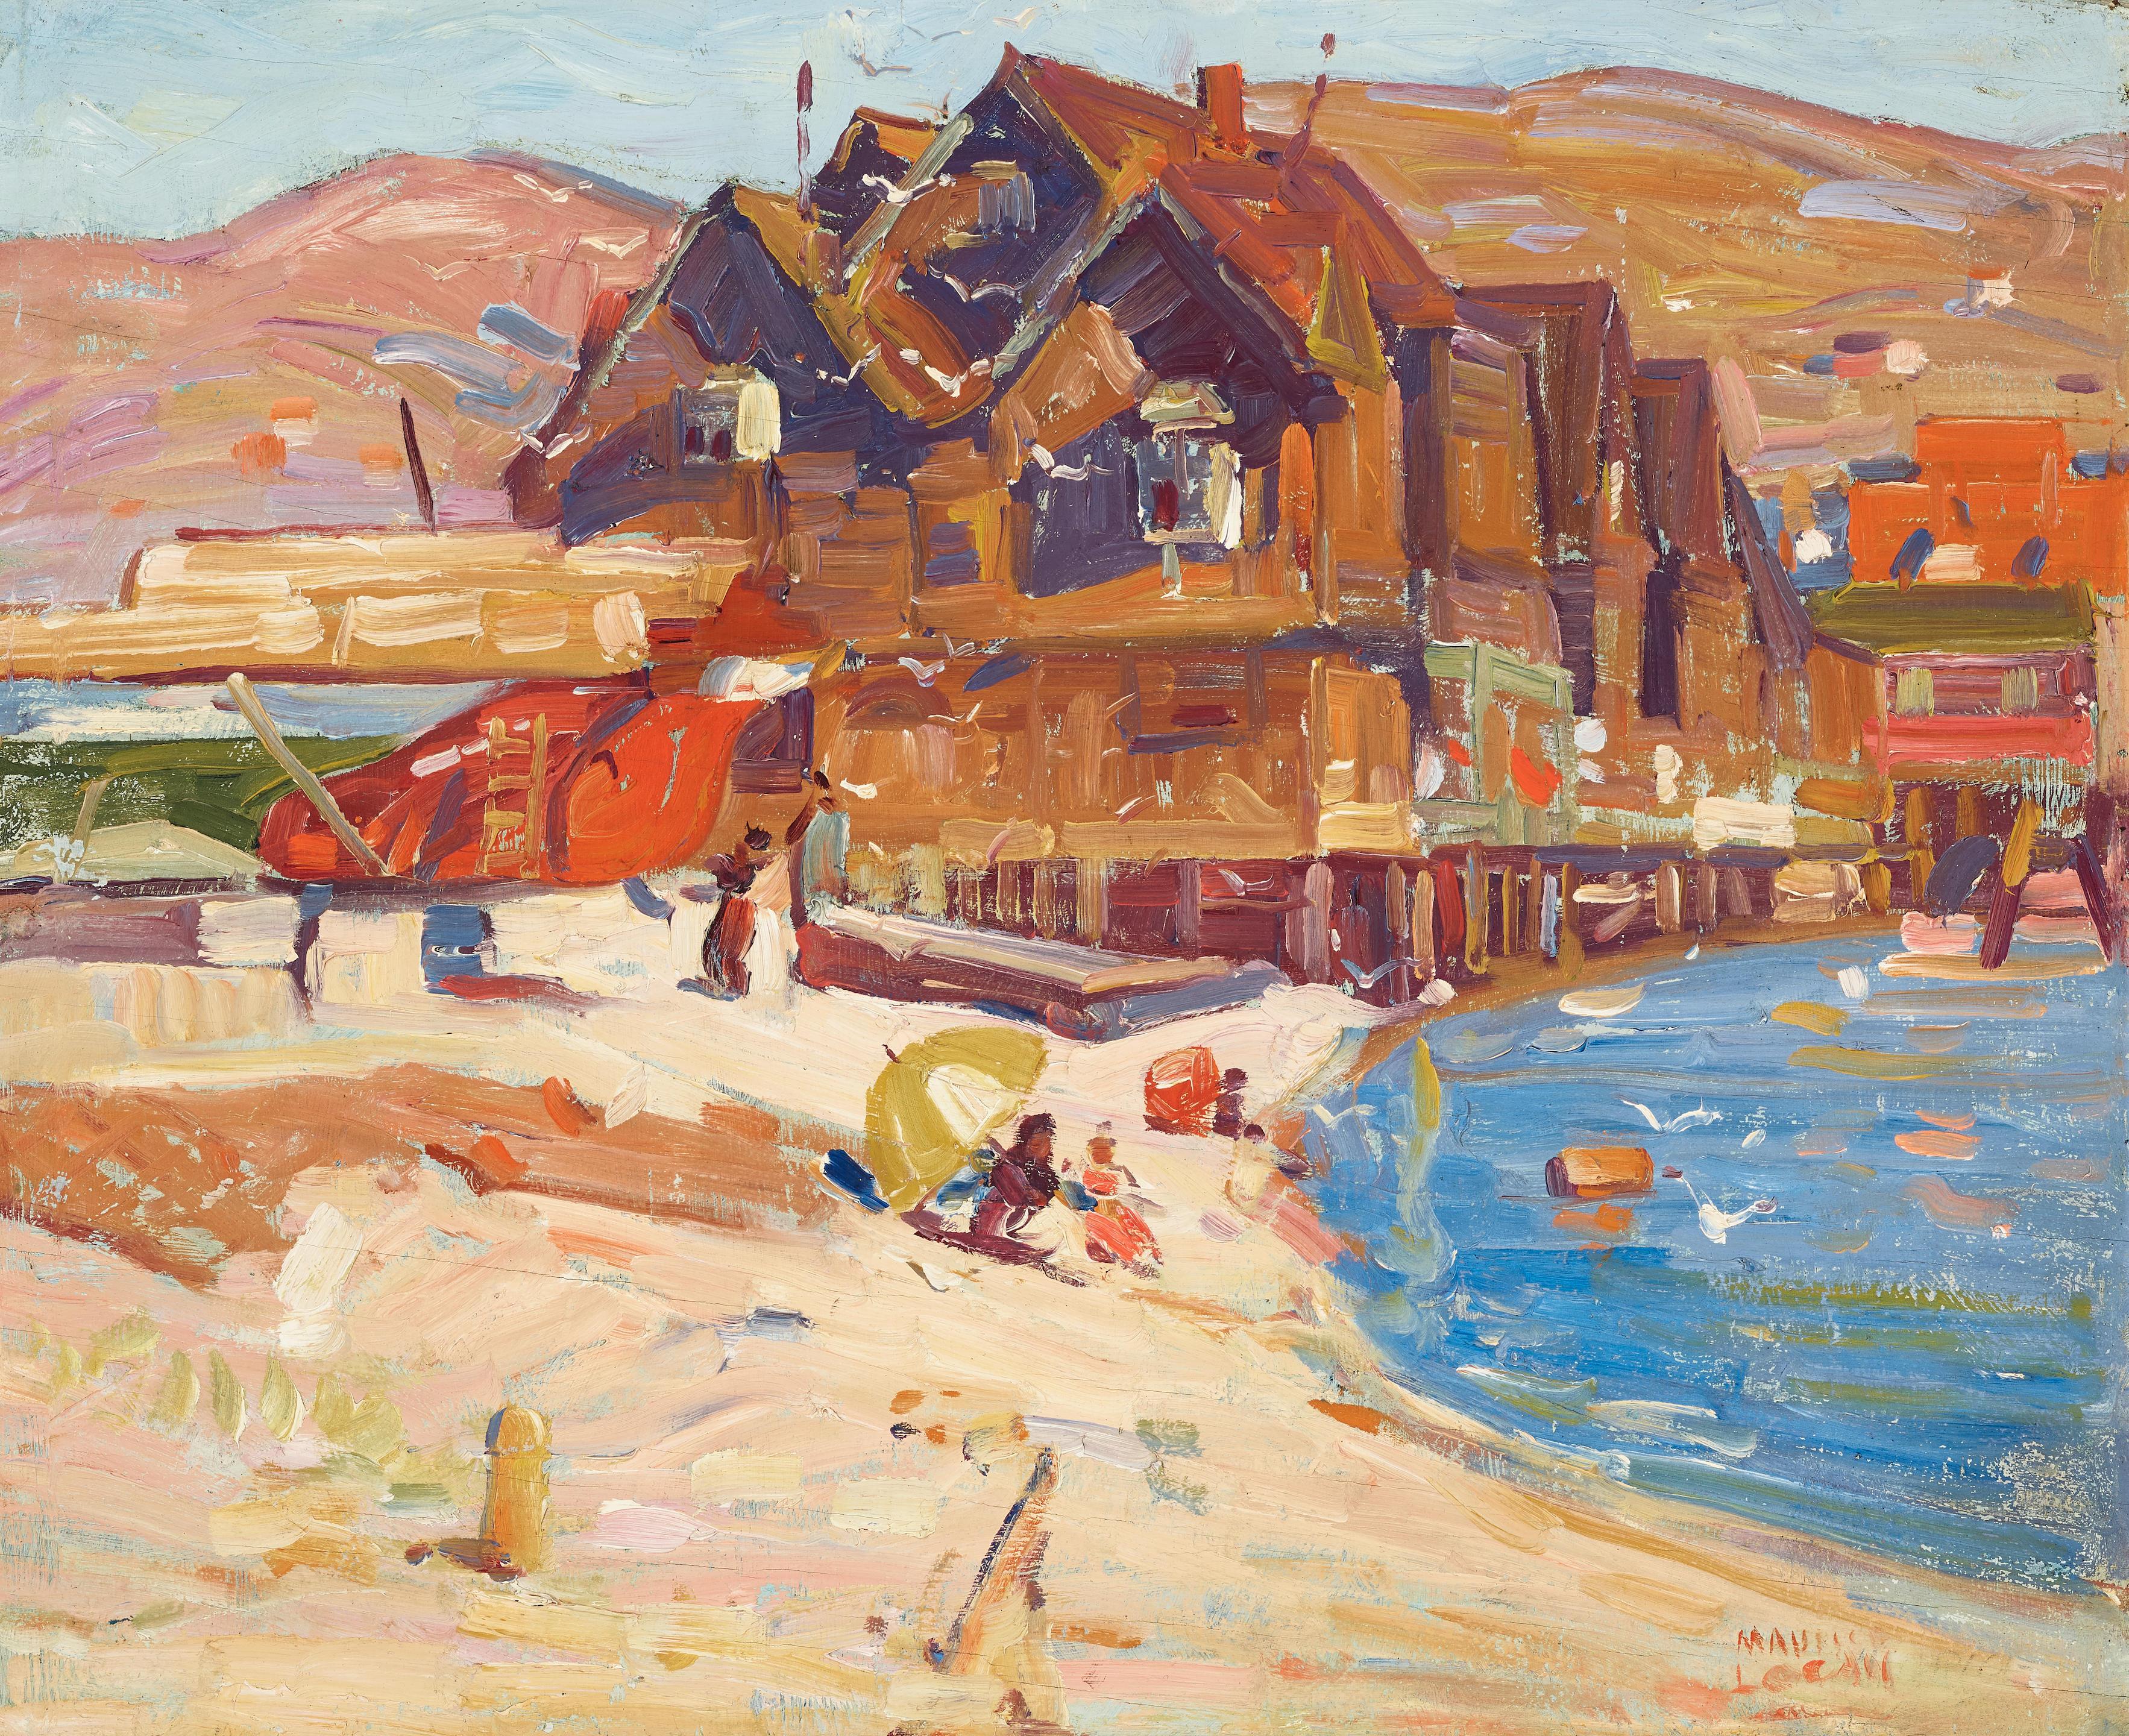 Maurice Logan (1886-1977)